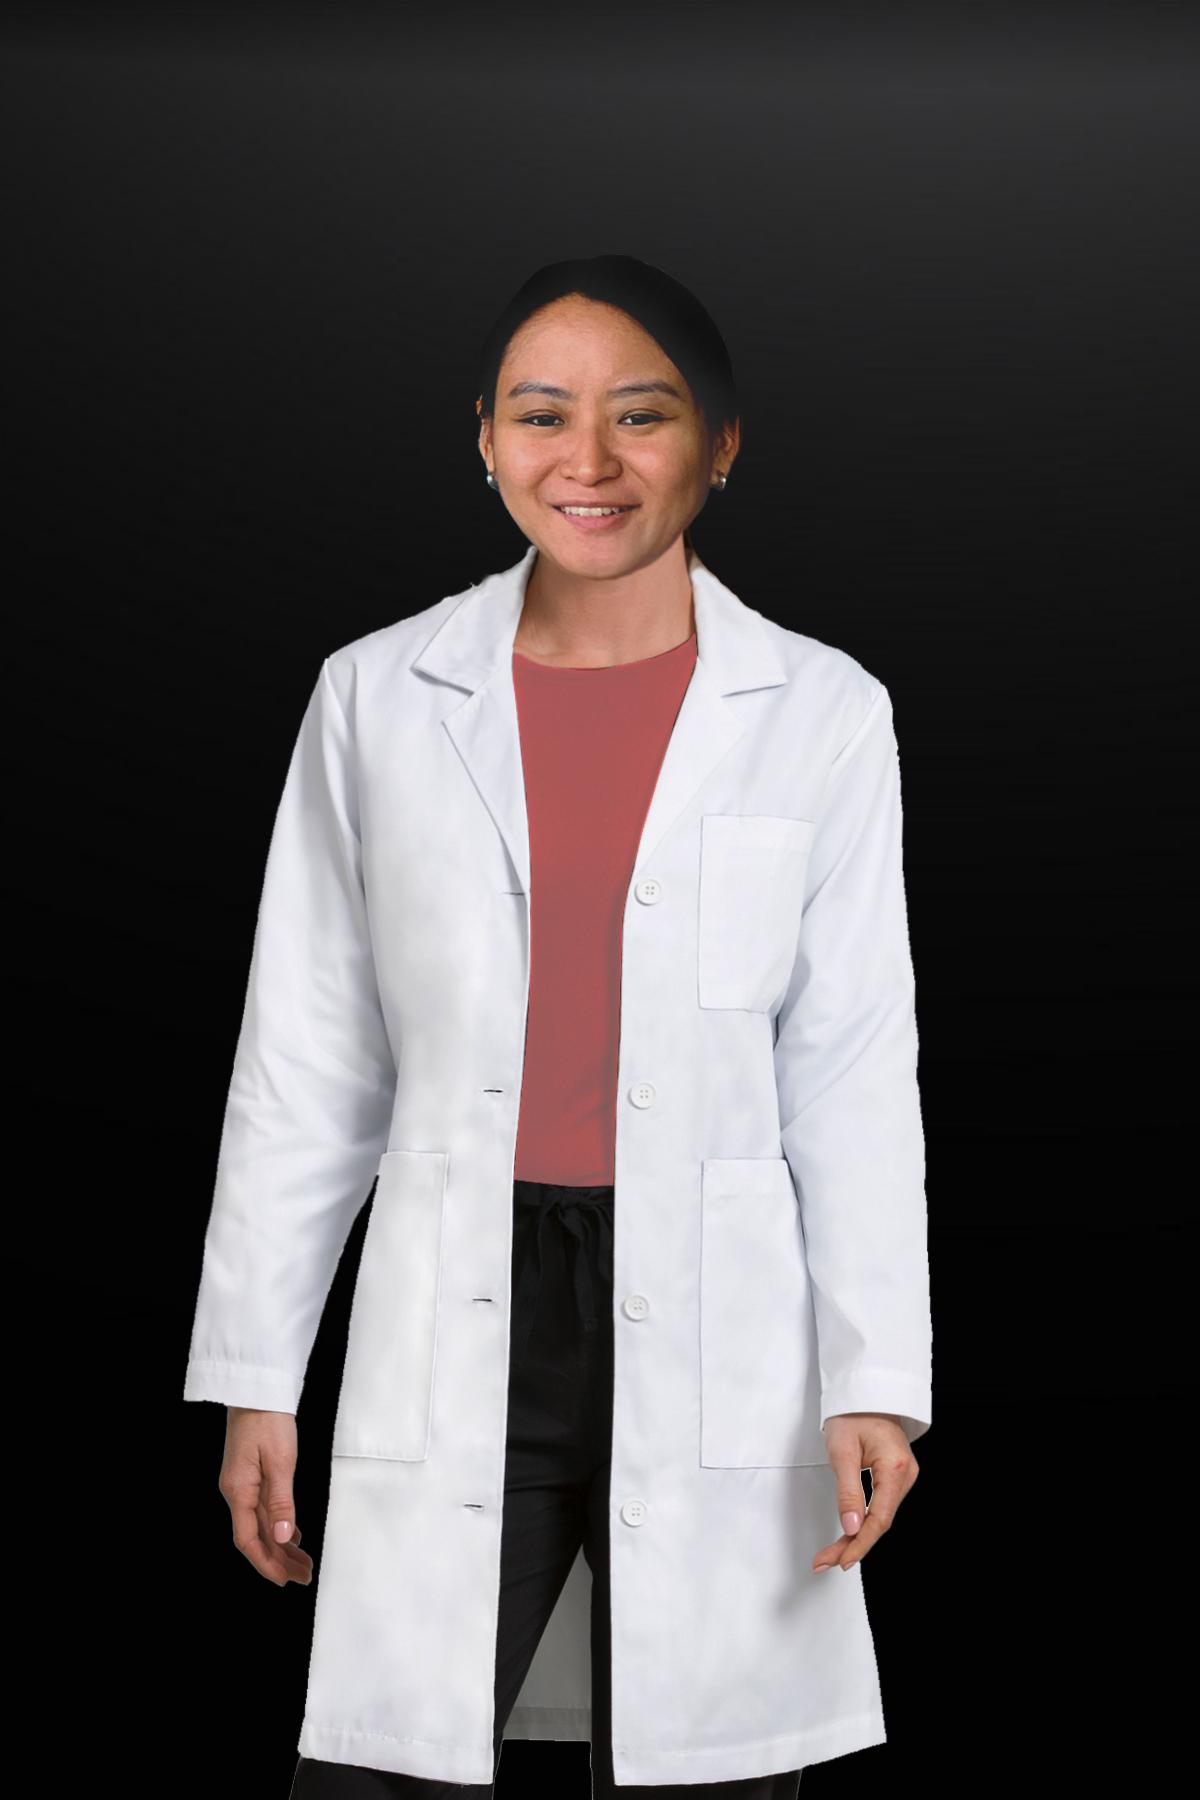 Kriselle Lao, MD, DPSP